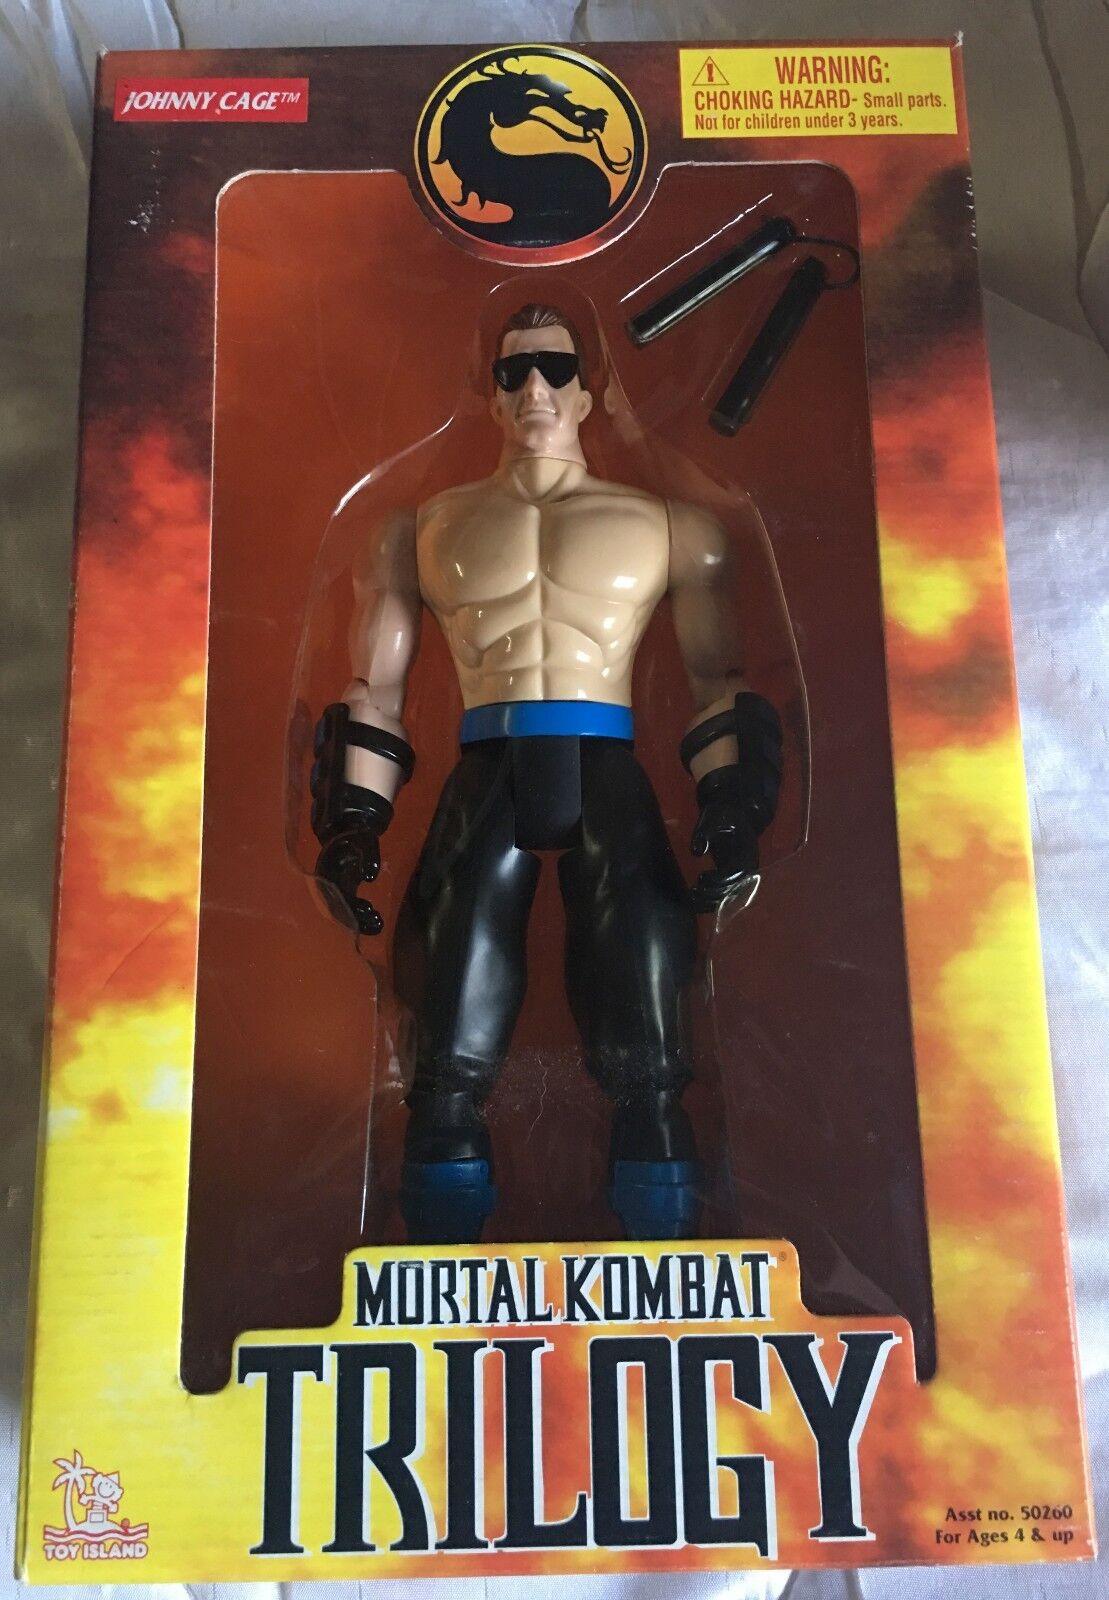 Mortal Kombat Trilogie: Johnny Cage 25.4cm Actionfigur Toy Island 1998 - Neu